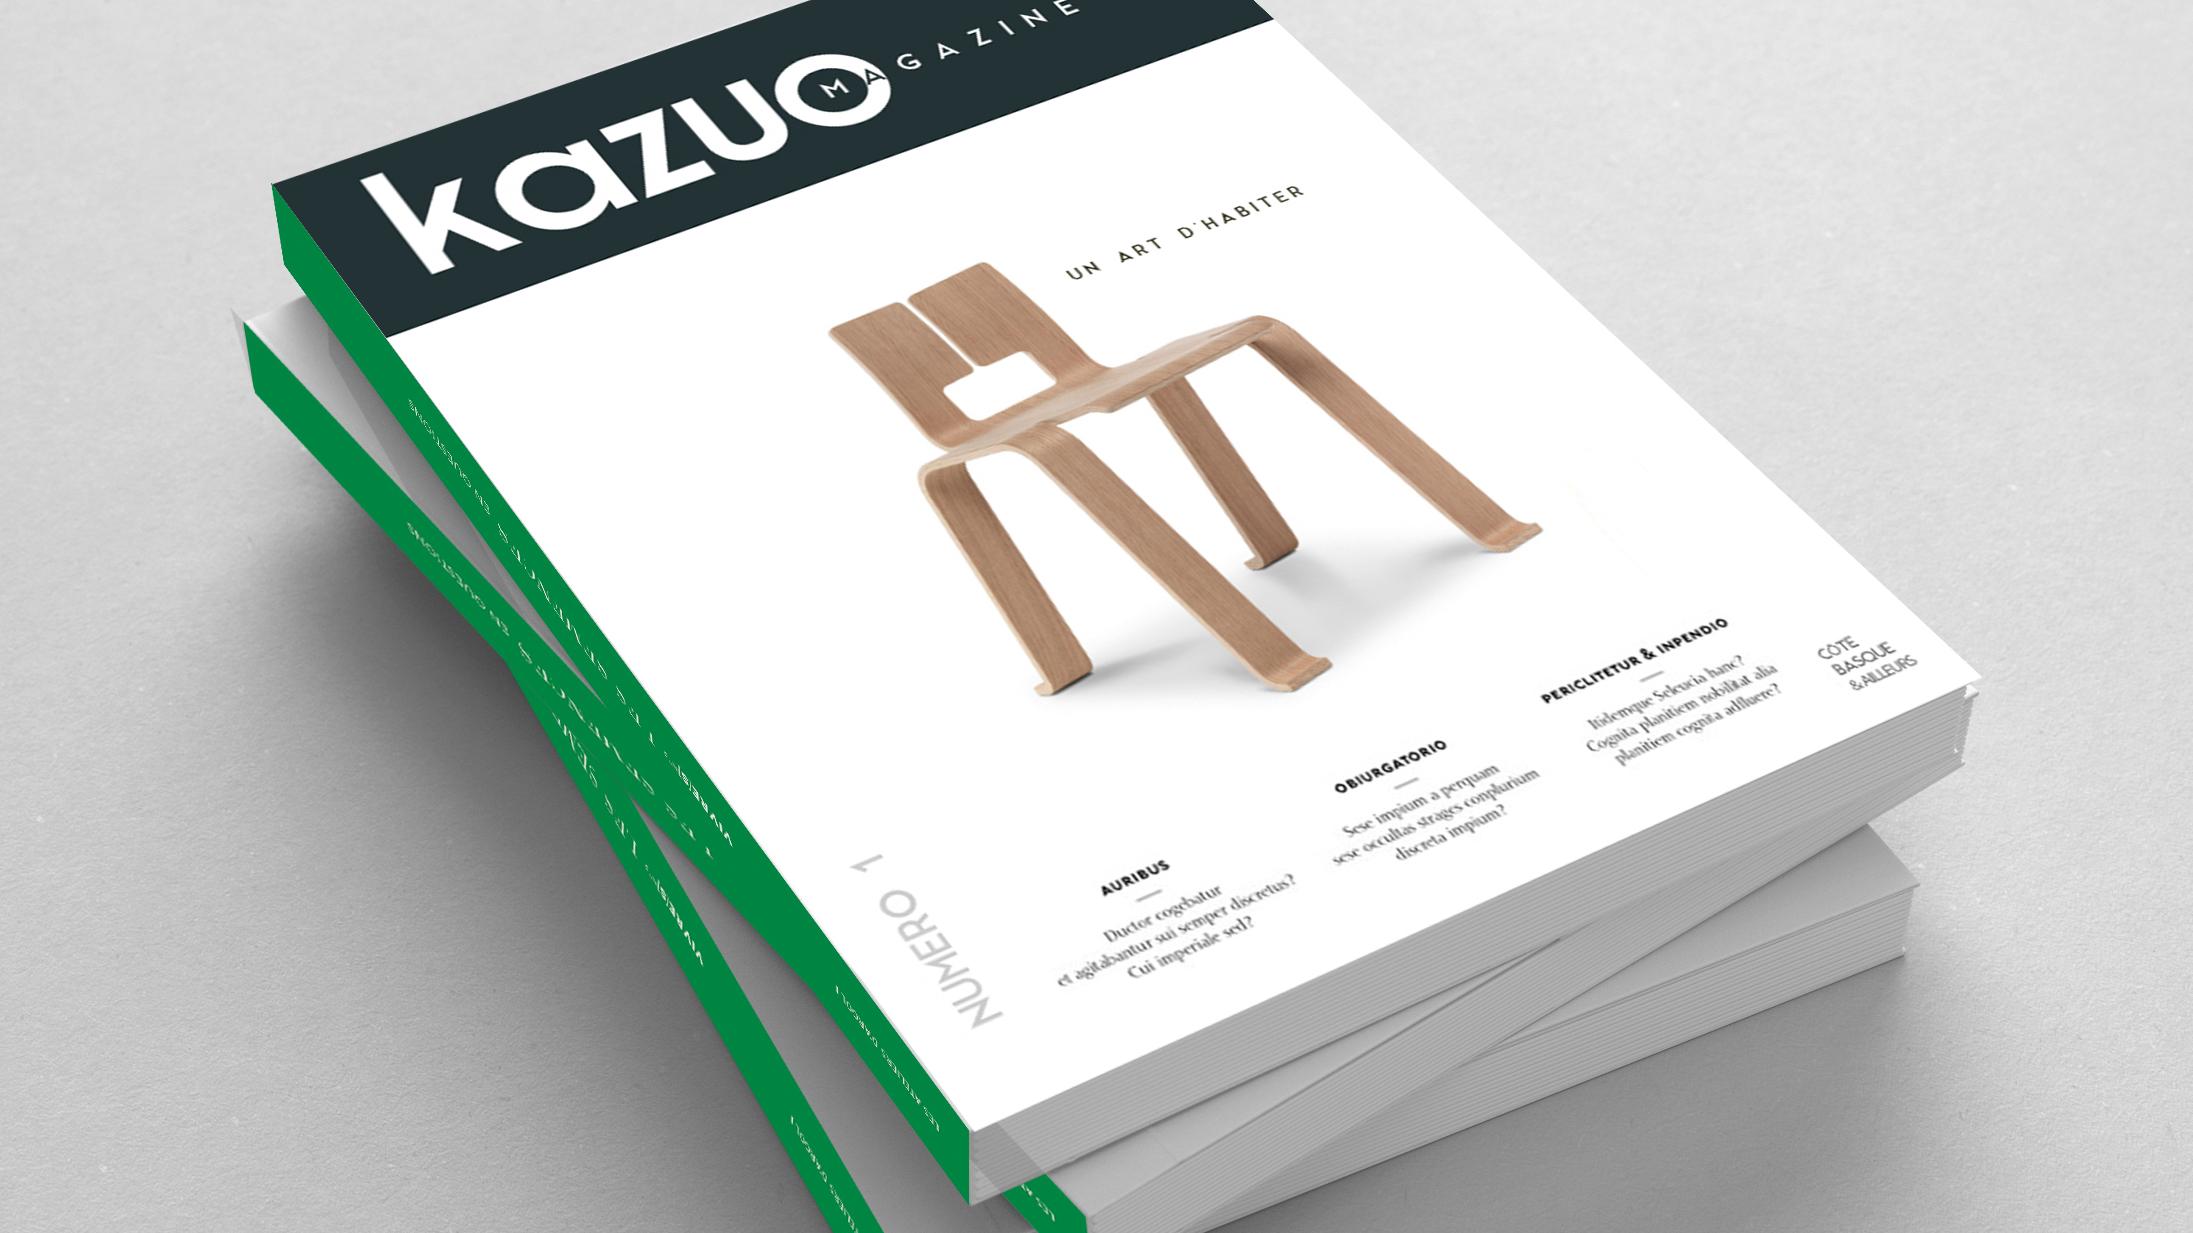 KAZUO-MAGAZINE-couverture-1516822906.jpg